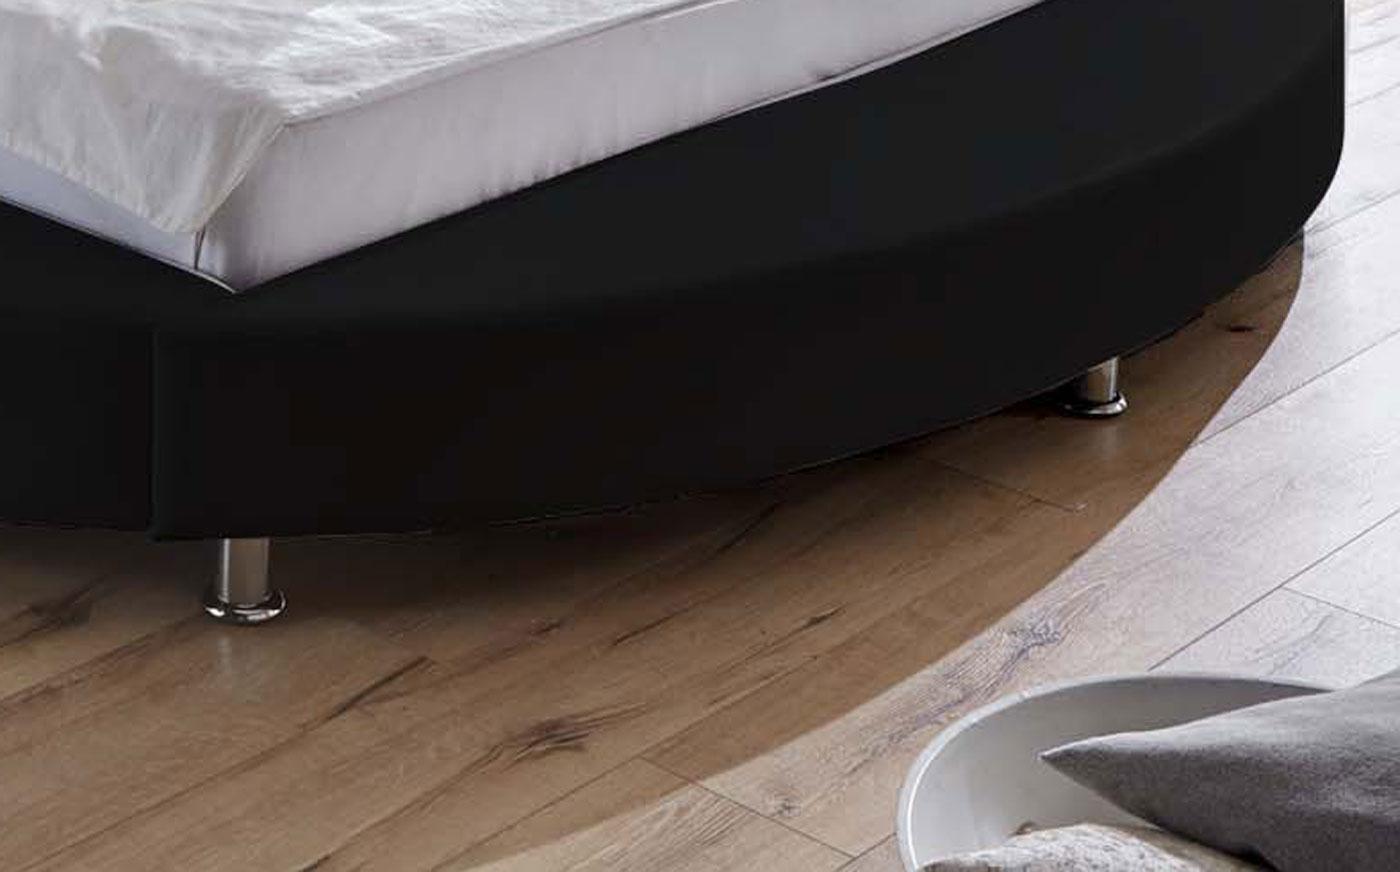 sam rundbett bebop 180 x 200 cm schwarz grau auf lager. Black Bedroom Furniture Sets. Home Design Ideas